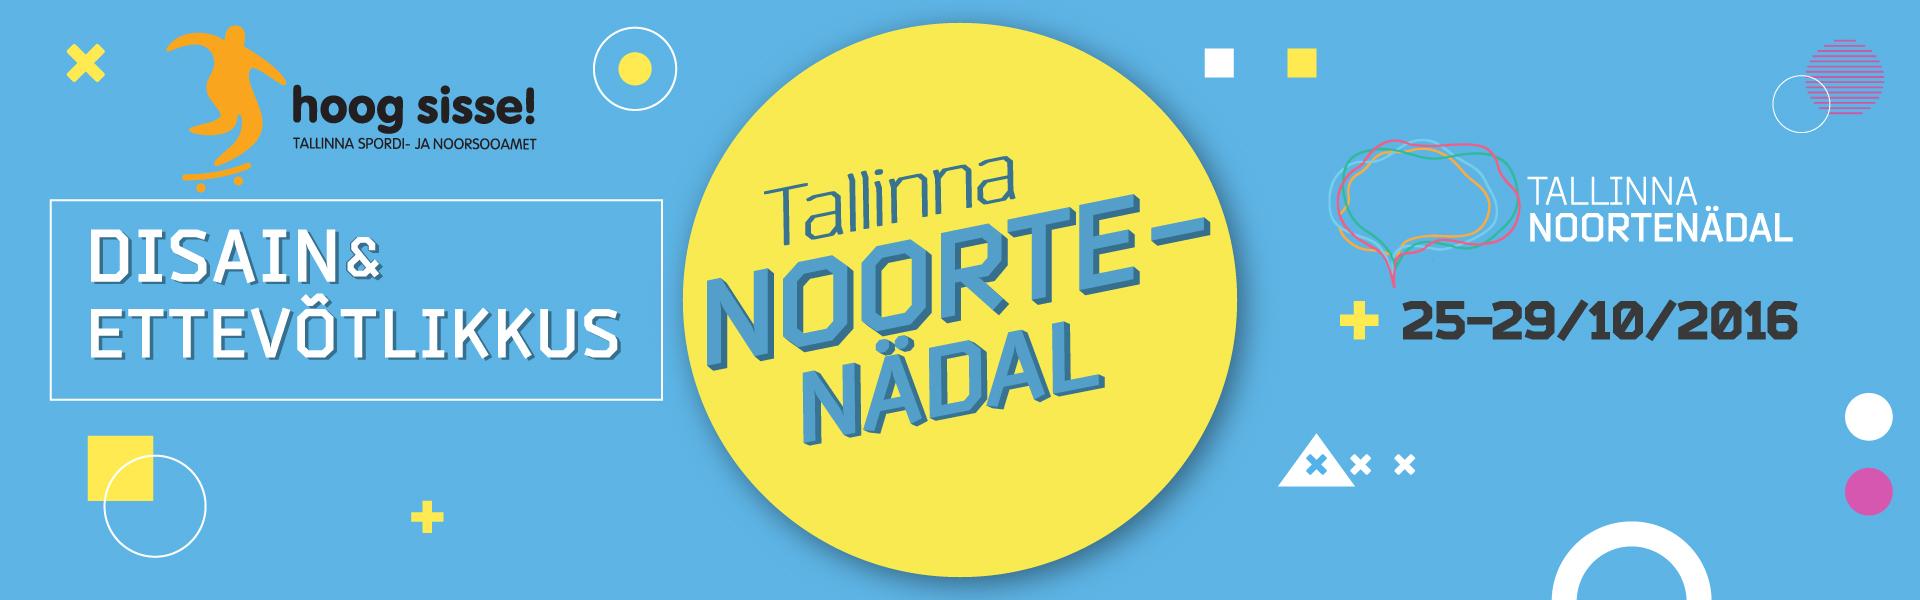 TALLINNA NOORTENÄDAL 2016